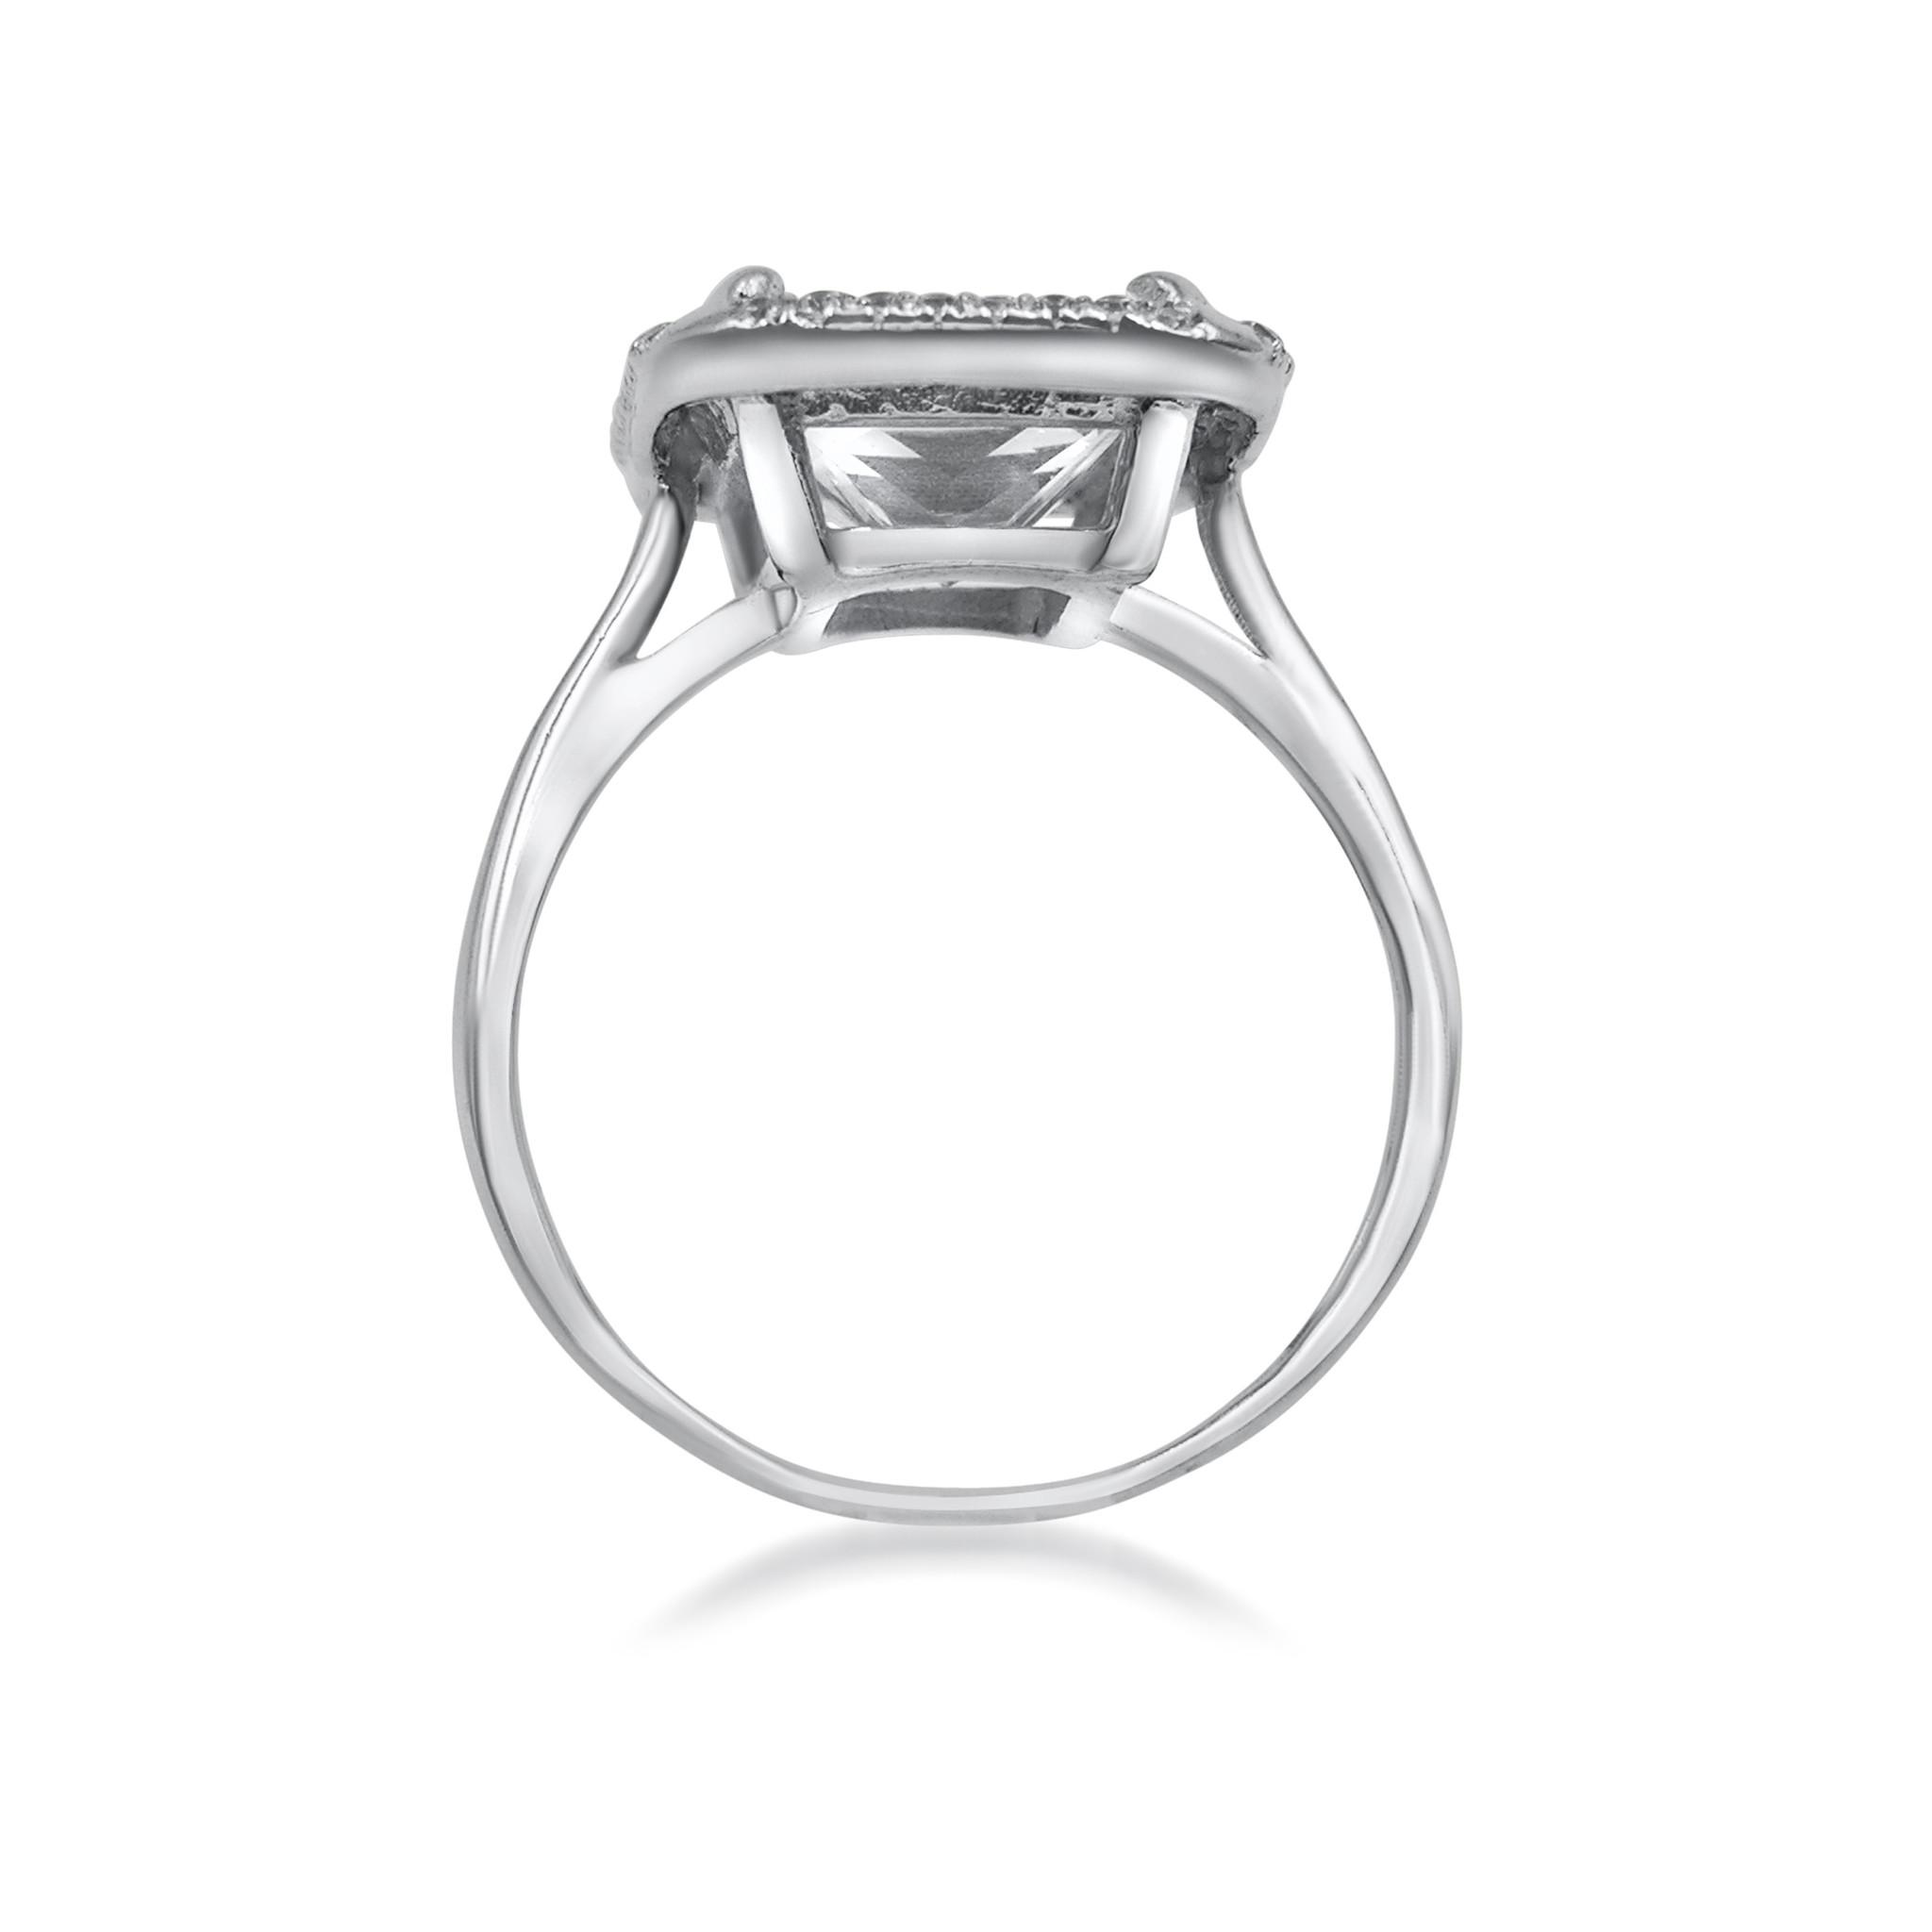 18 karat white gold engagement ring with zirconia